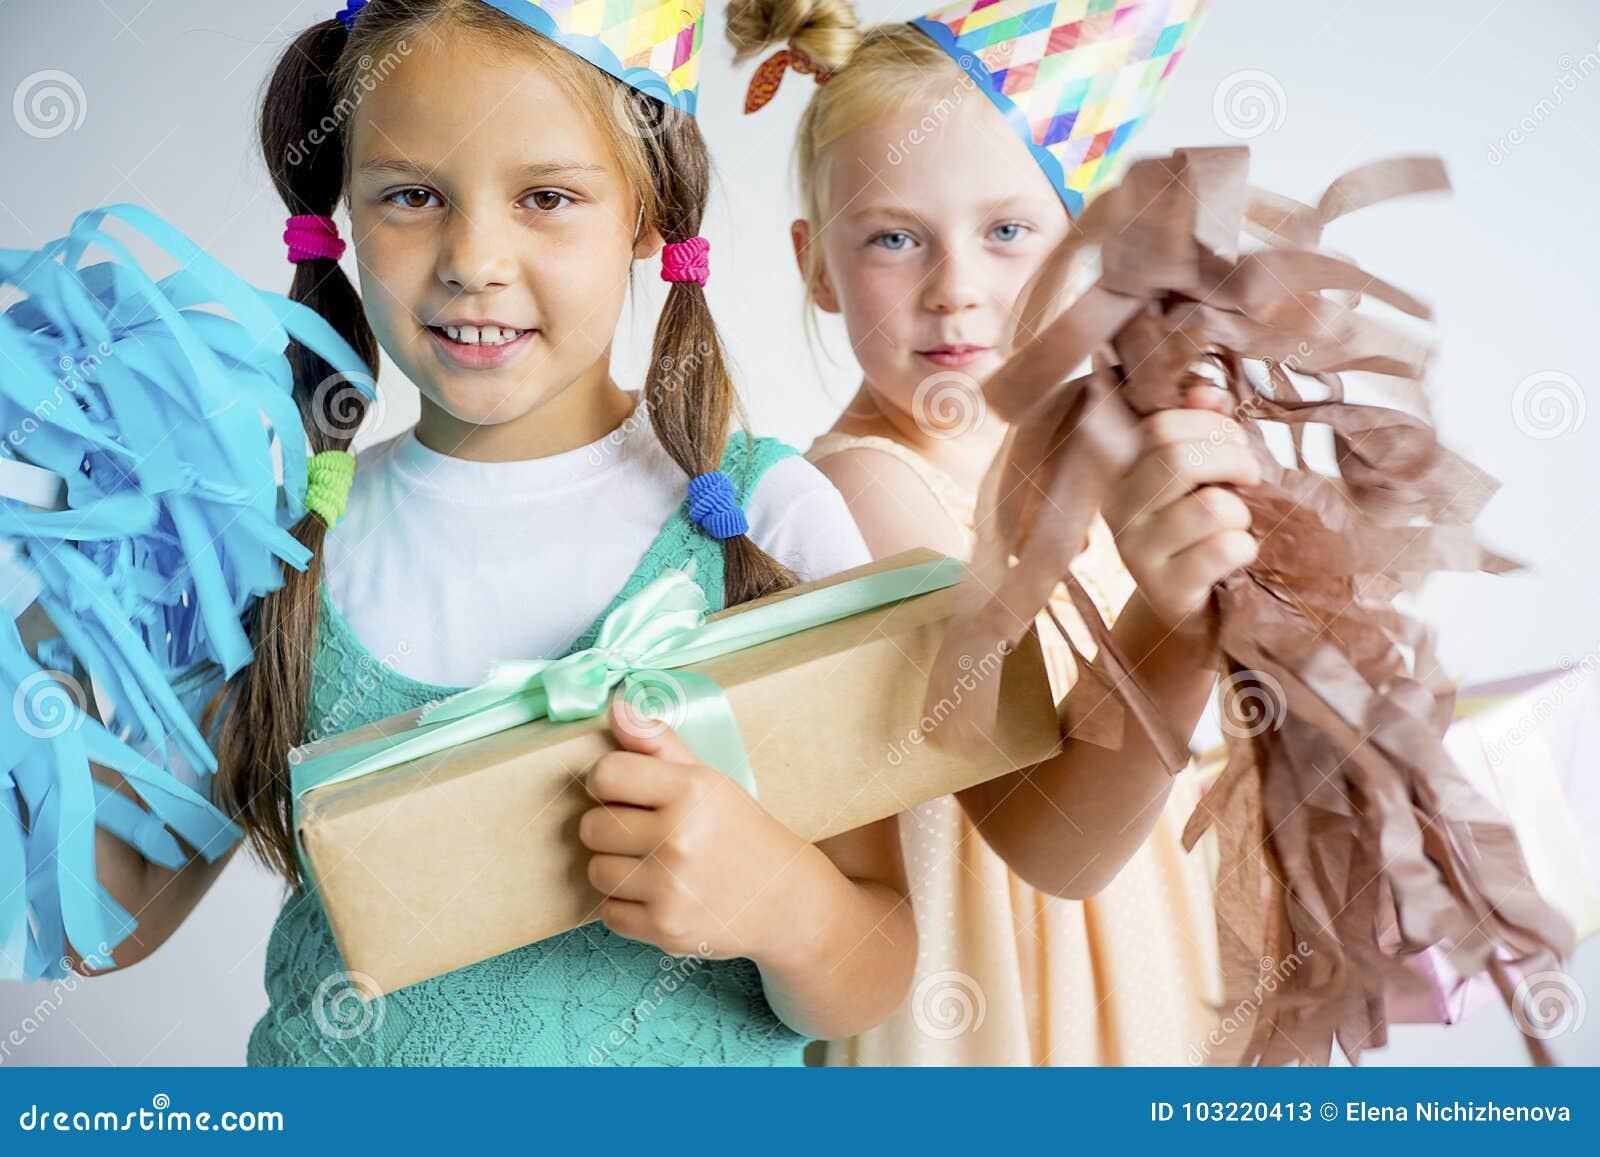 Teens birthday party